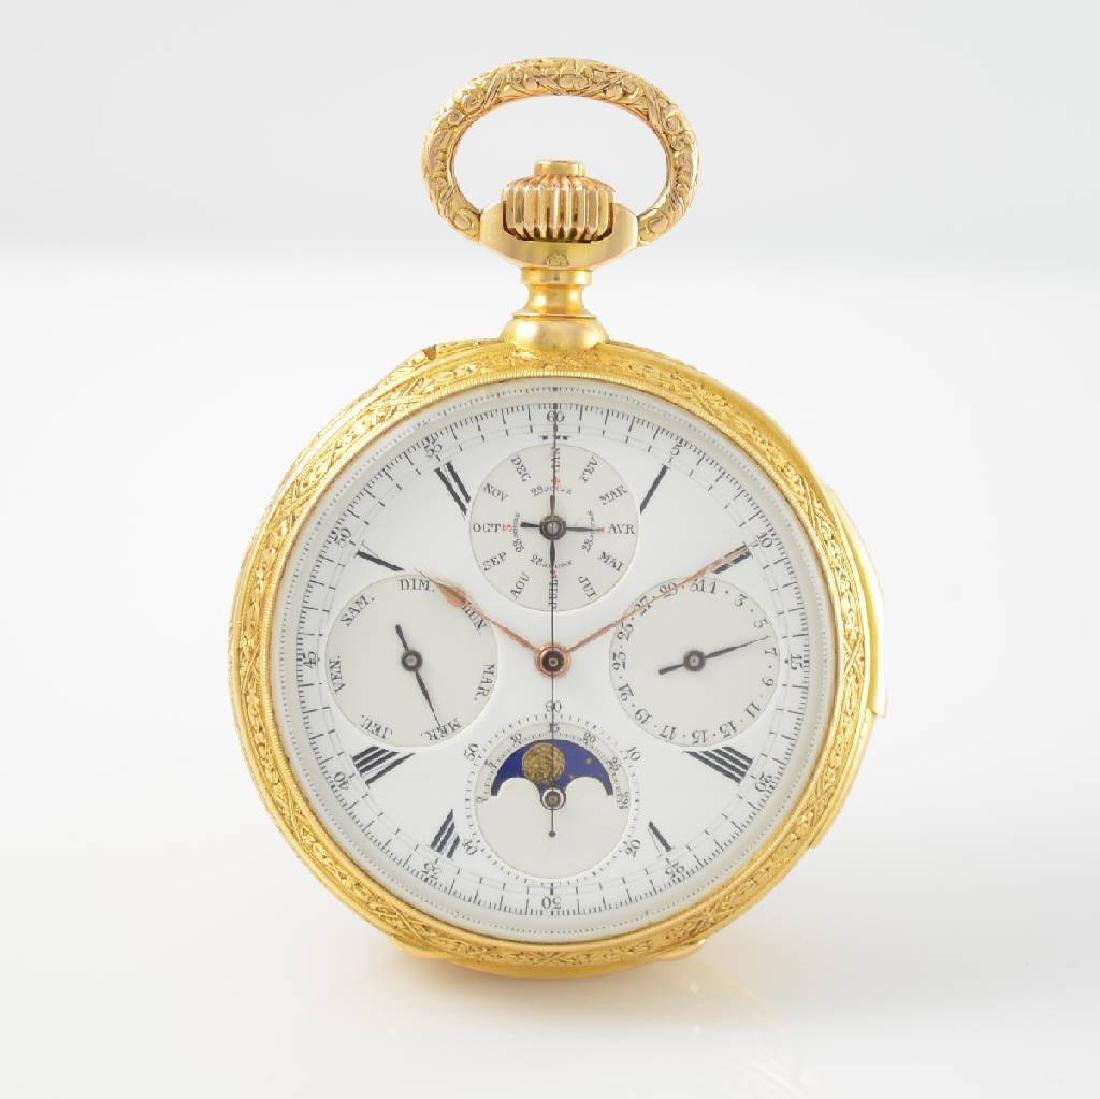 LOUIS AUDEMARS attributed unusual enamel pocket watch